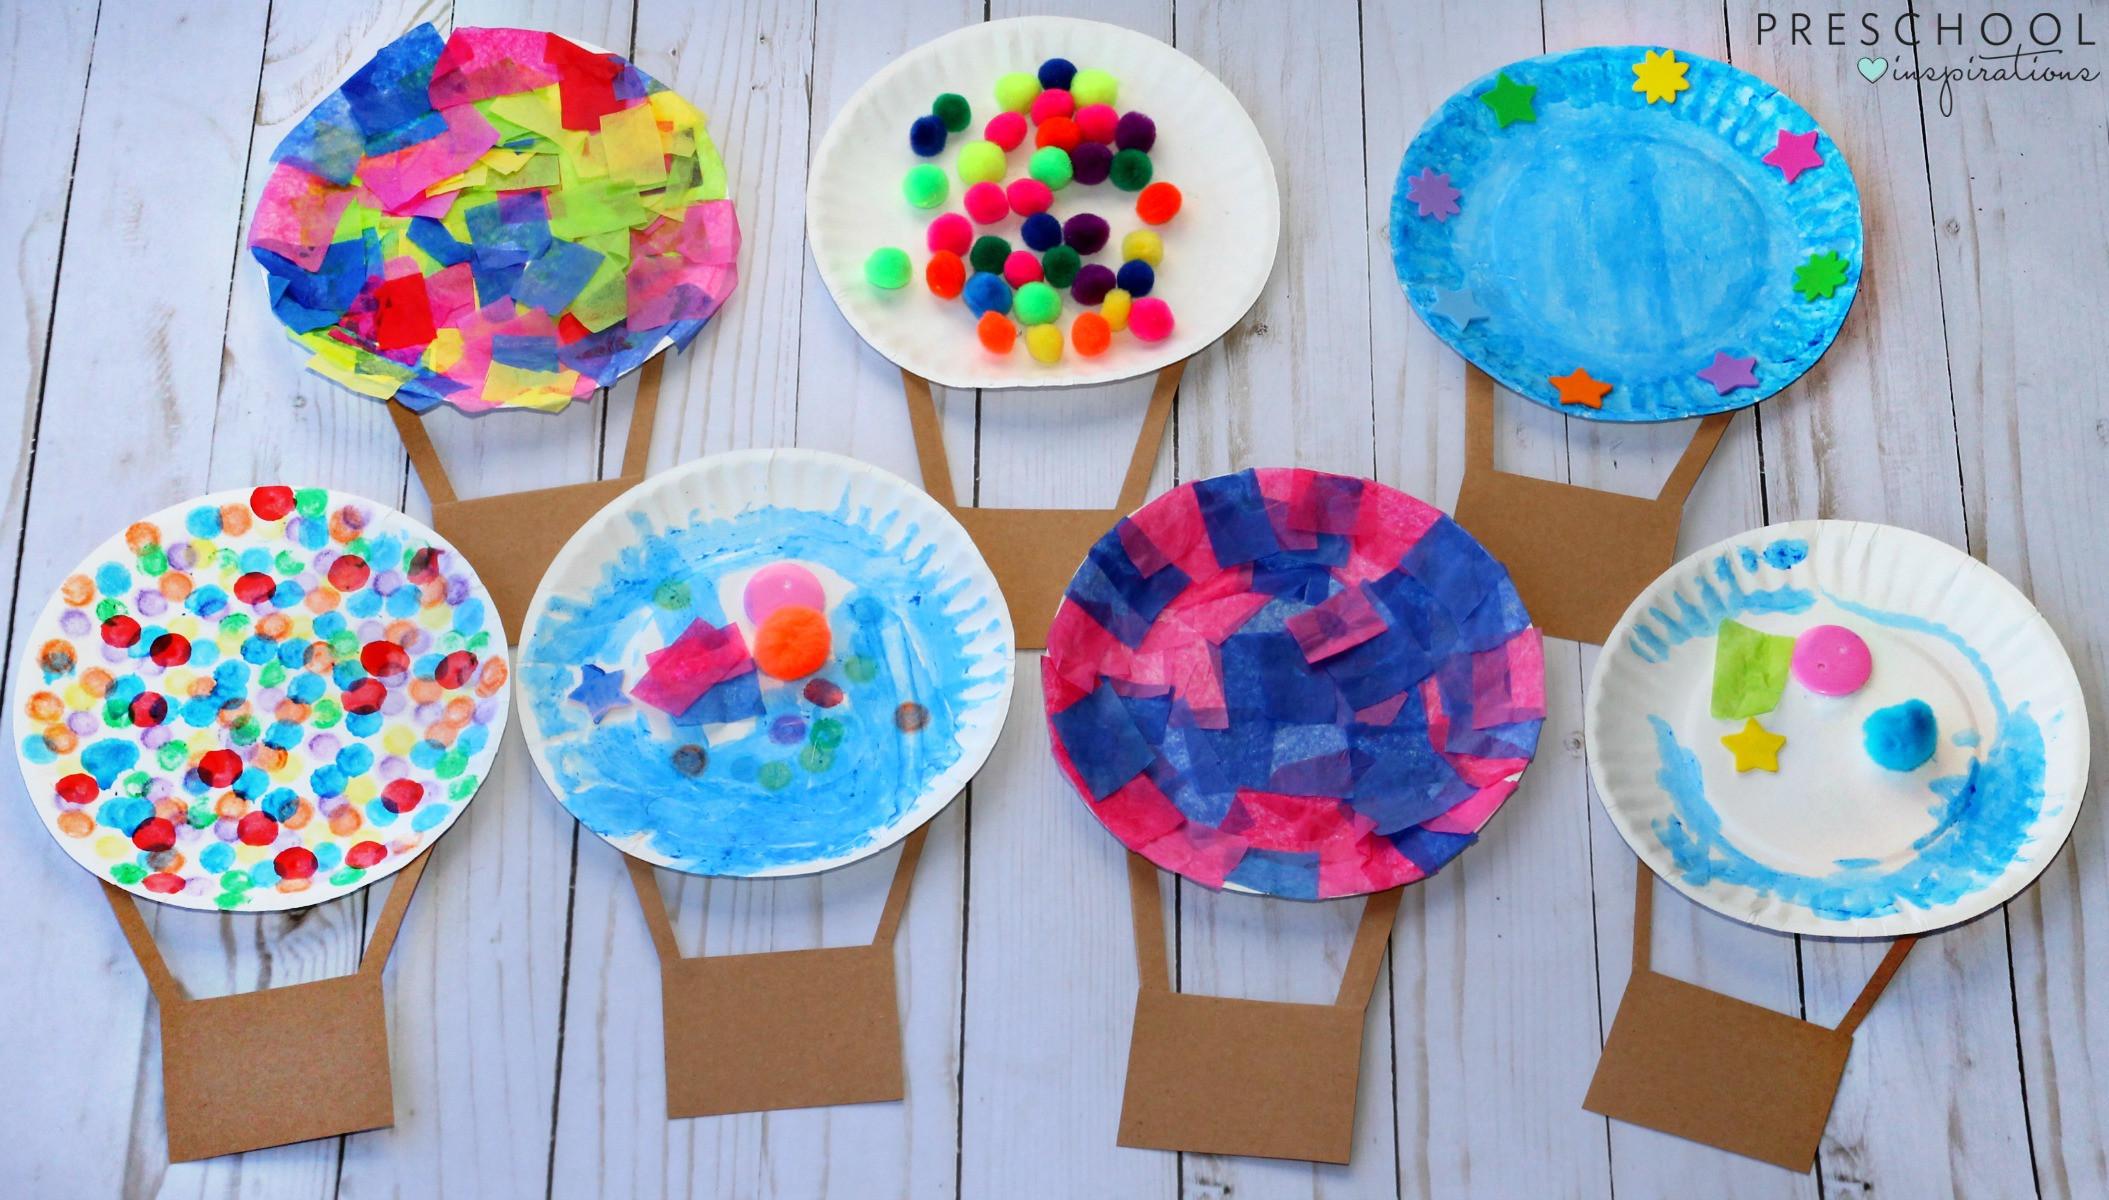 Best ideas about Craft Activities For Preschoolers . Save or Pin Hot Air Balloon Process Art Activity Preschool Inspirations Now.